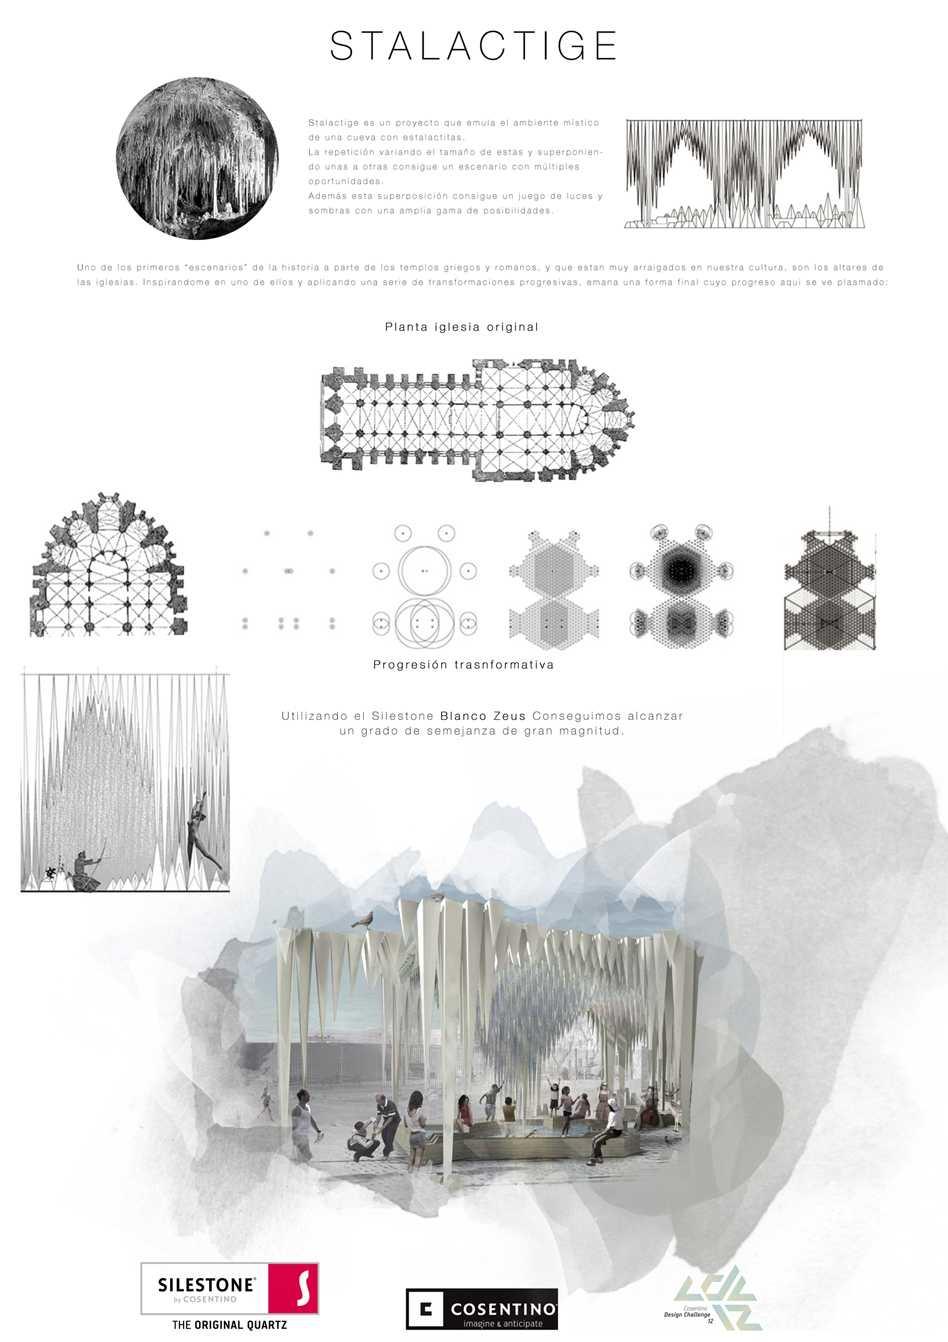 Cosentino Design Challenge12  - 23 06 33